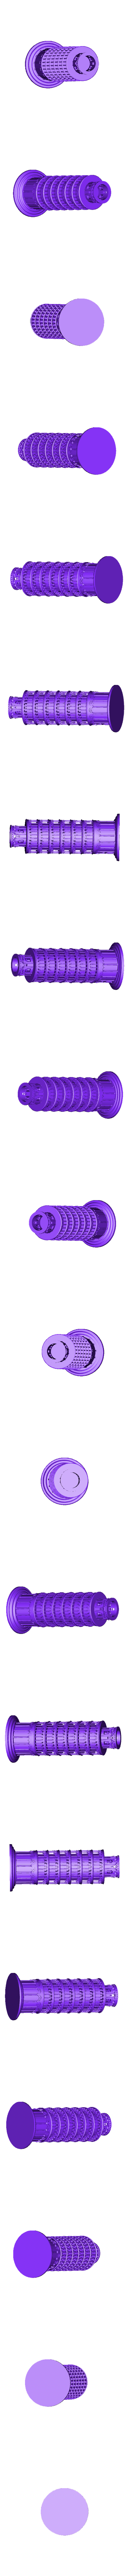 Leaning_Tower_of_Pisa.stl Download STL file Leaning Tower of Pisa • 3D printing object, Chrisibub